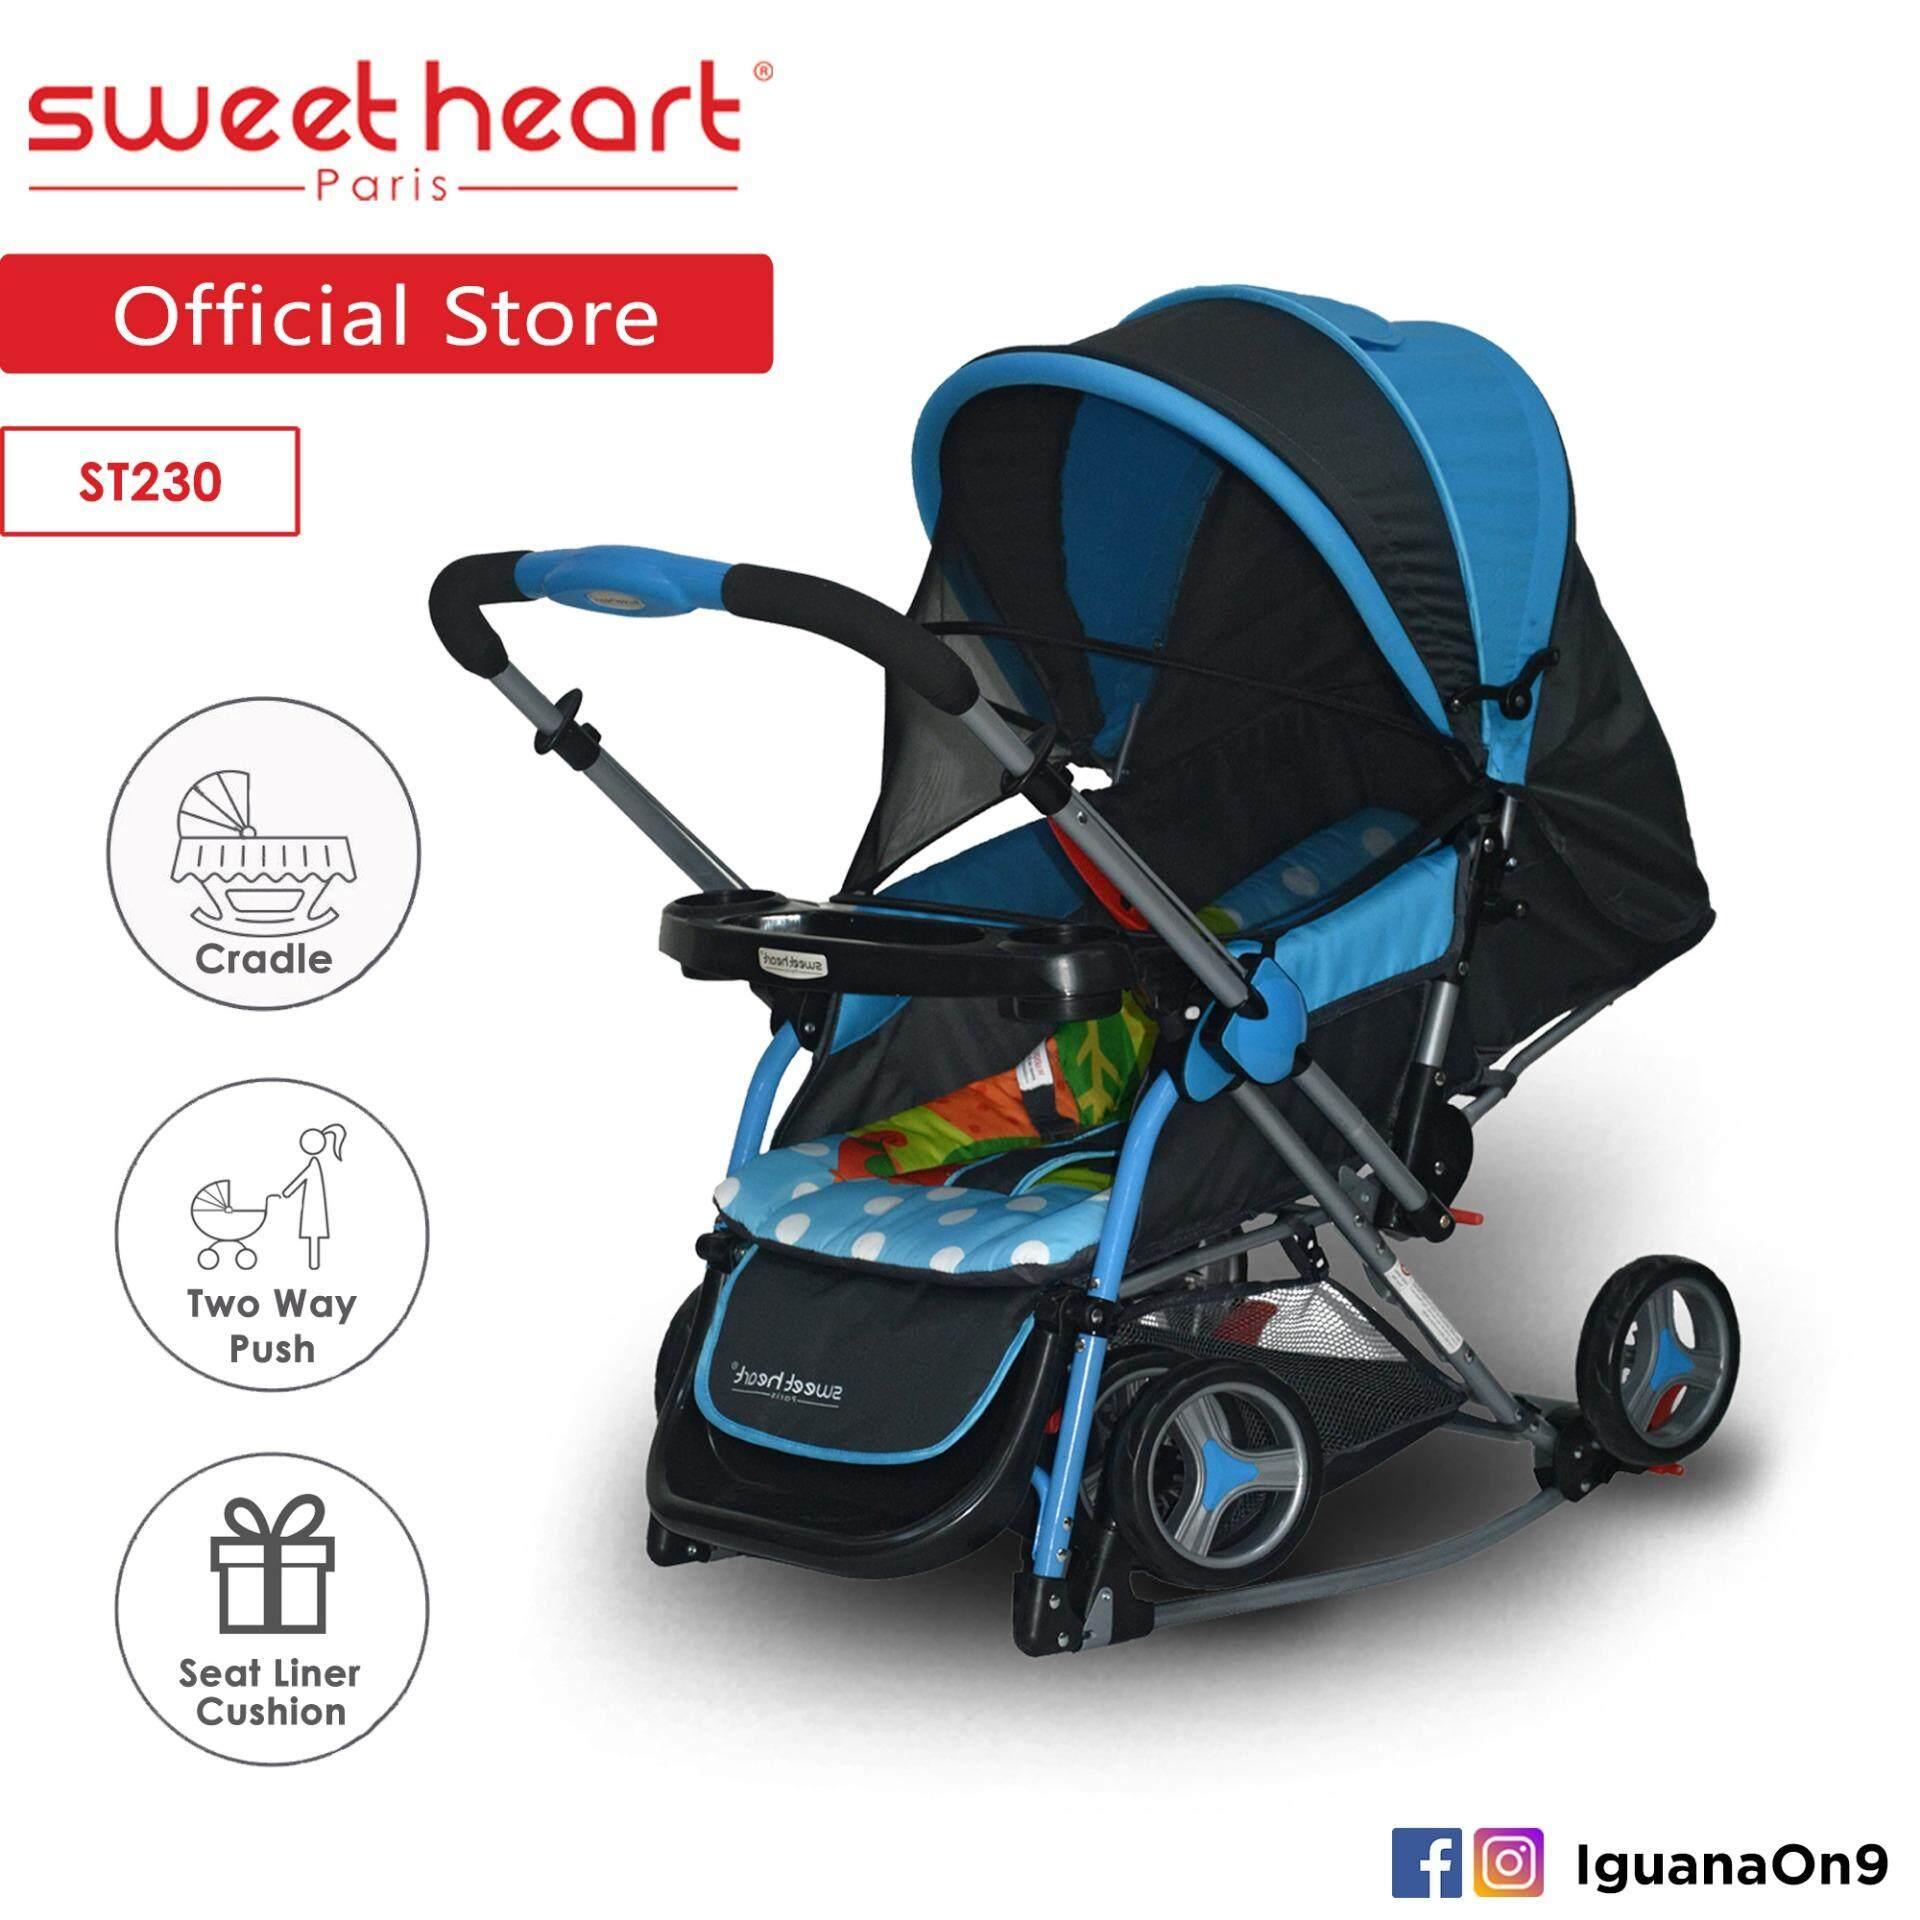 Sweet Heart Paris Aluminium 2IN1 Stroller + Rocker Cradle ST230 (Blue) Bundle with Mosquito Net & Reversible Handlebar